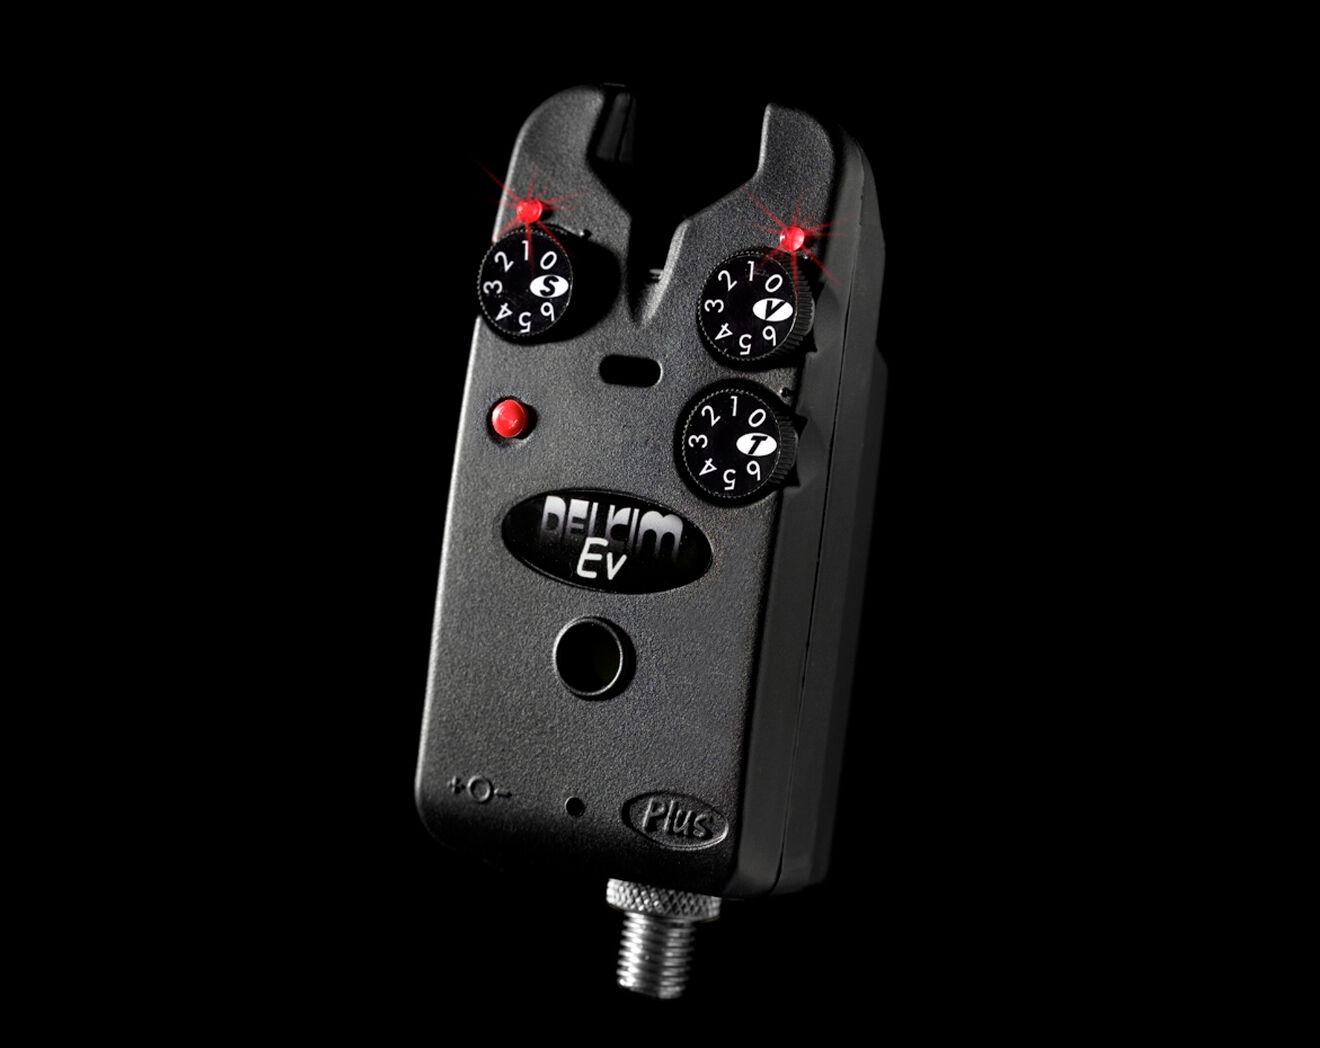 Delkim EV Plus Electronic Bite Alarm   Red   Carp Fishing